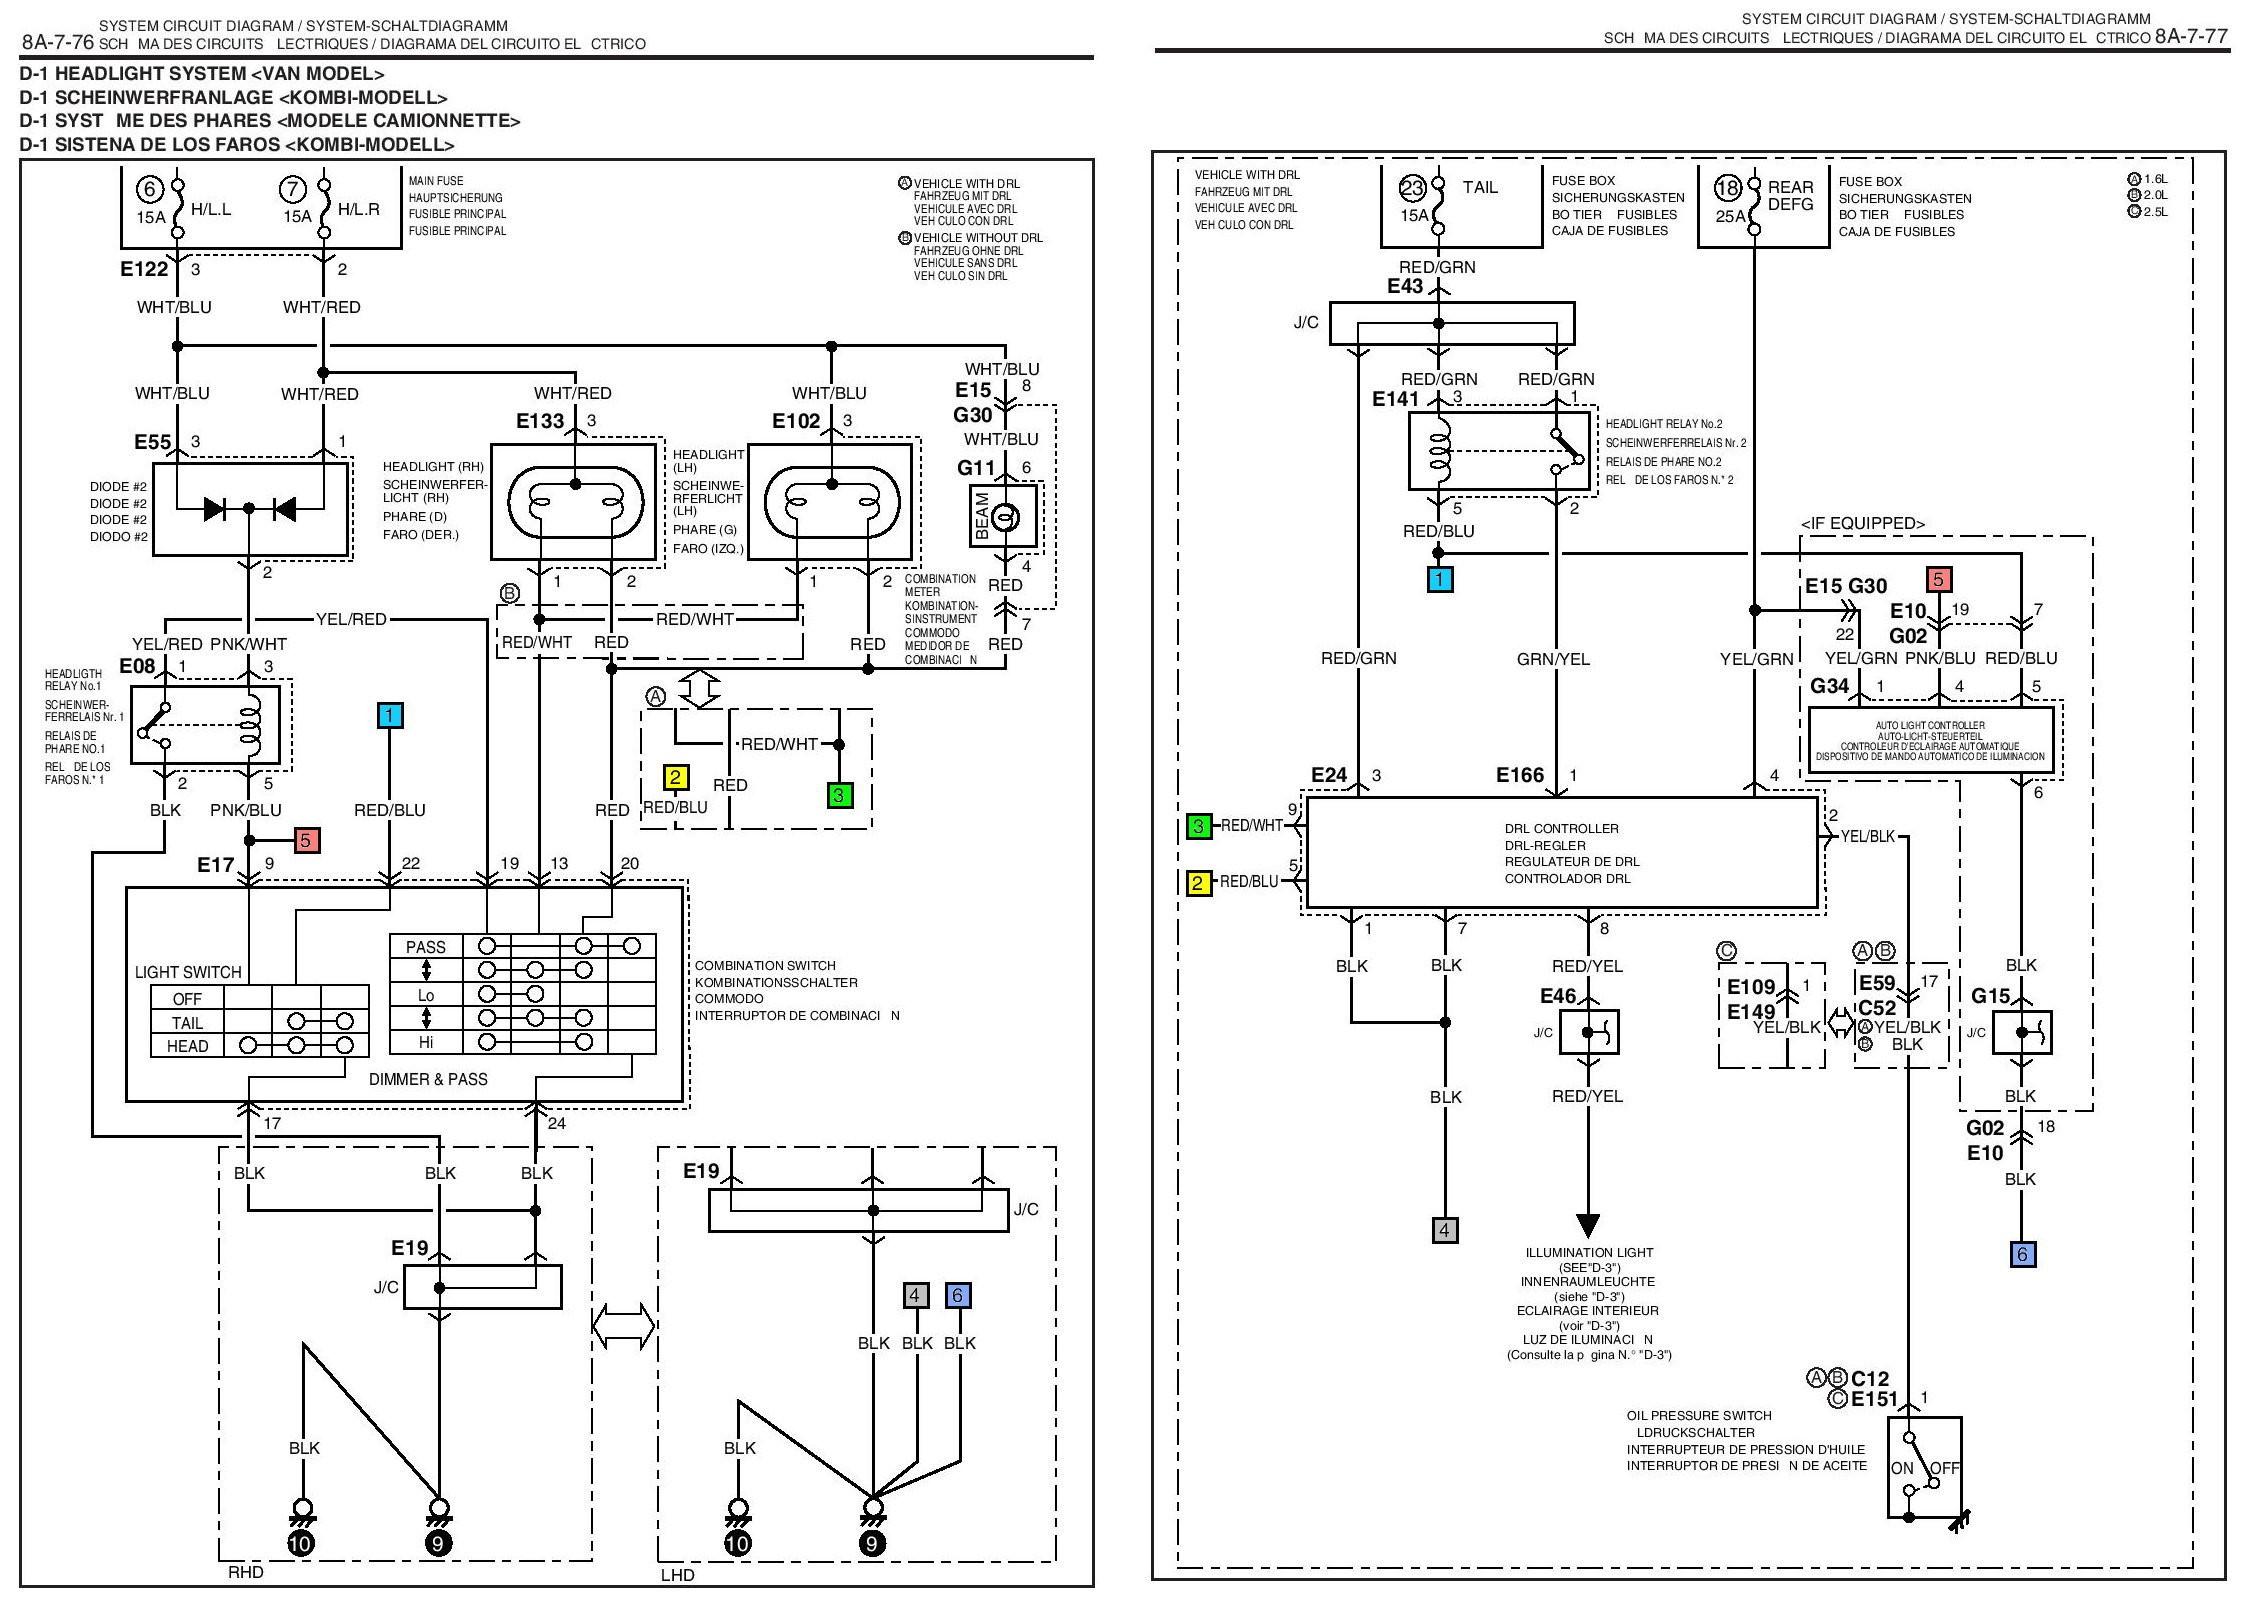 suzuki grand vitara exhaust system diagram wiring schematics diagram 2007 suzuki  grand vitara interior 2007 suzuki grand vitara headlight wiring diagram